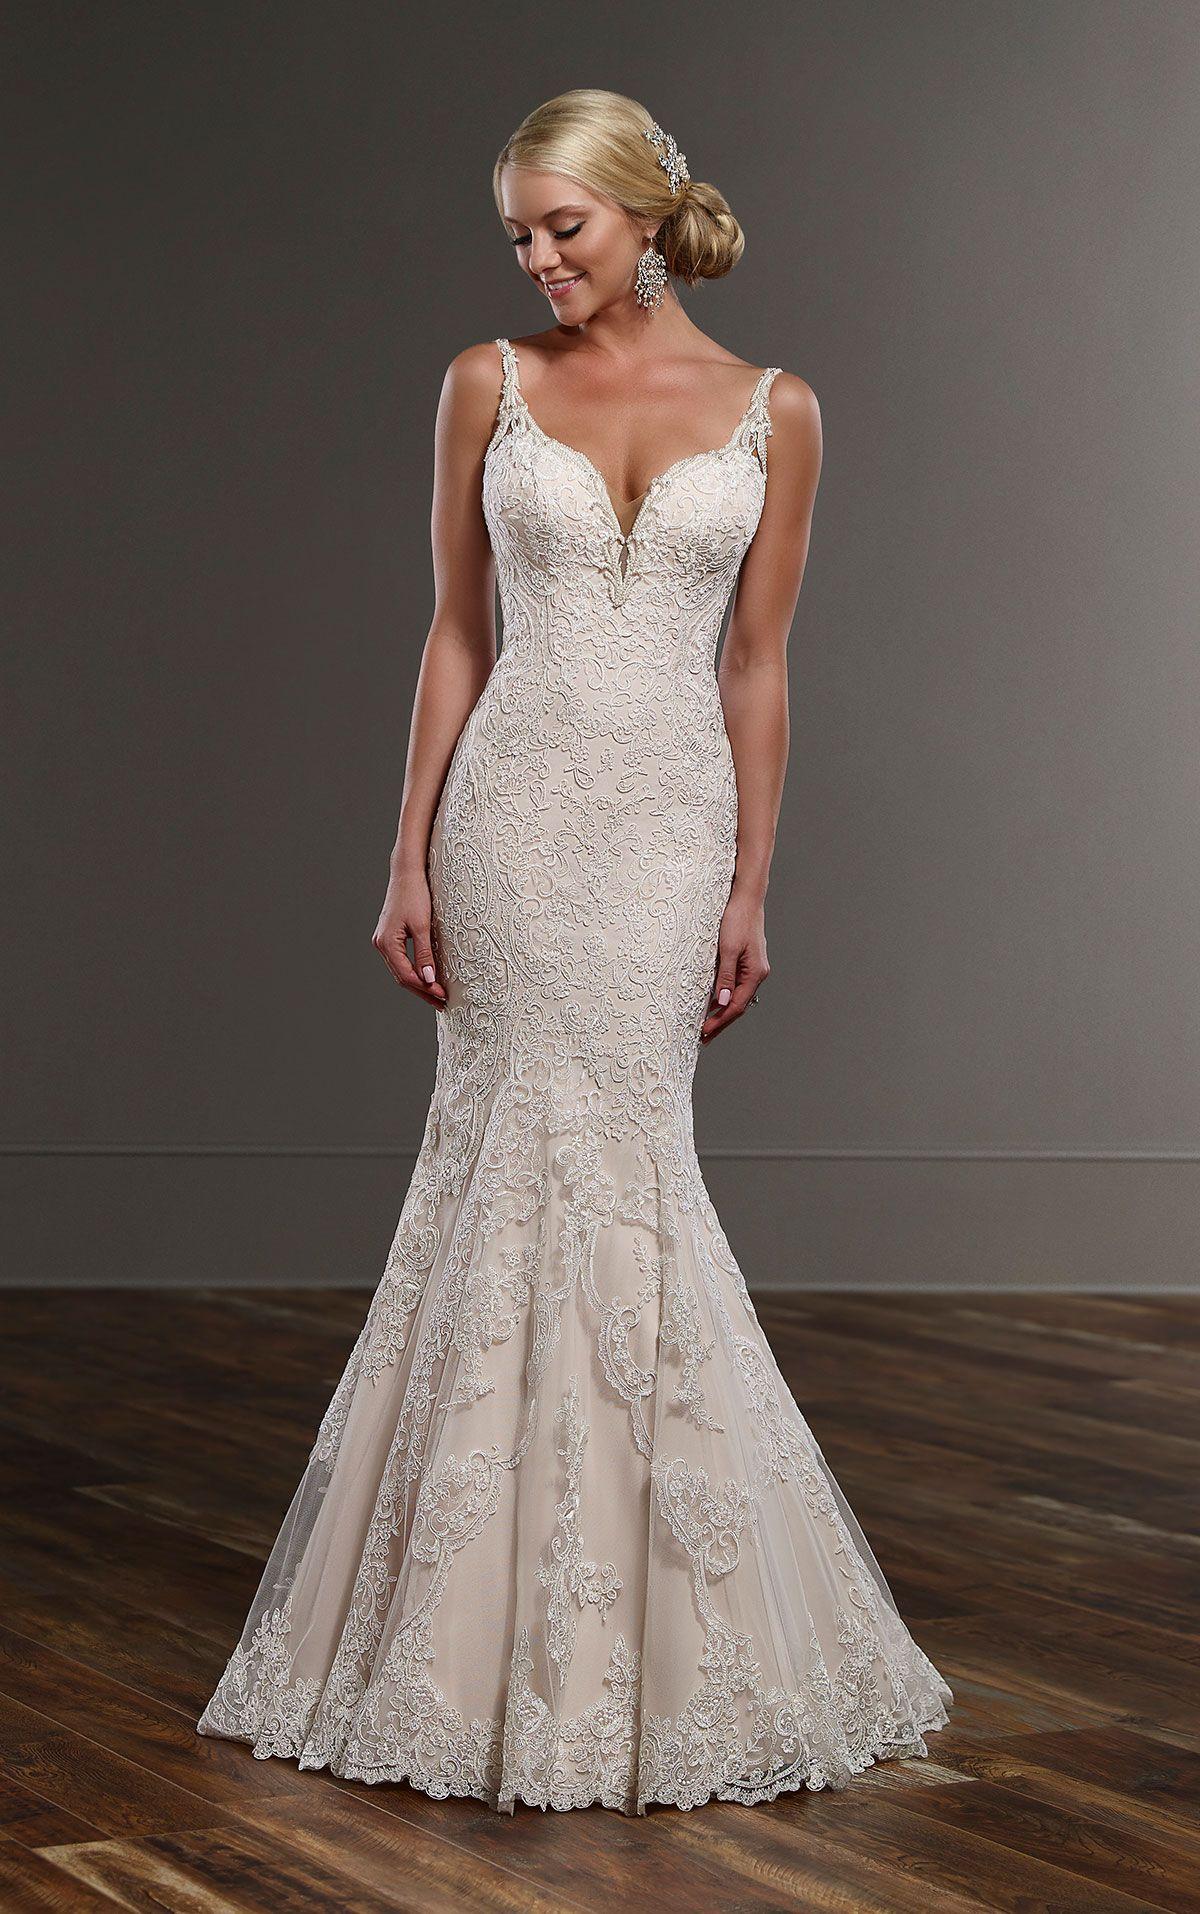 Designer wedding gown bridal boutique wedding dress and wedding